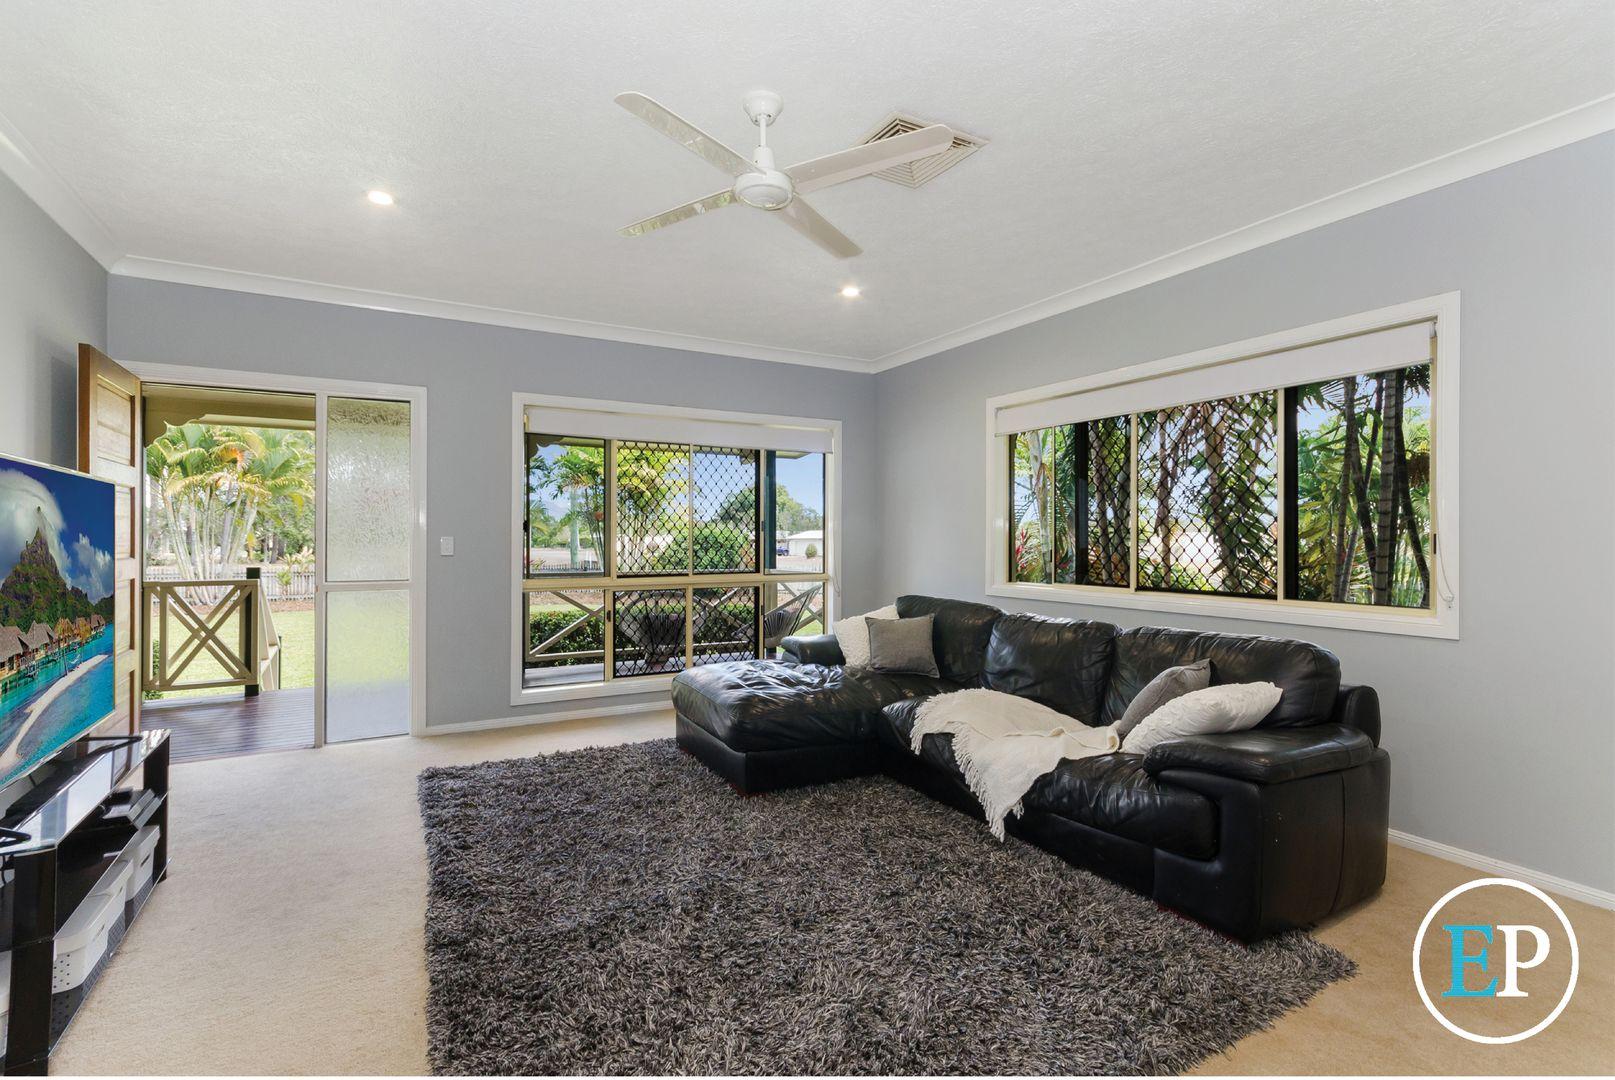 1 Benjamin Road, Rangewood QLD 4817, Image 2